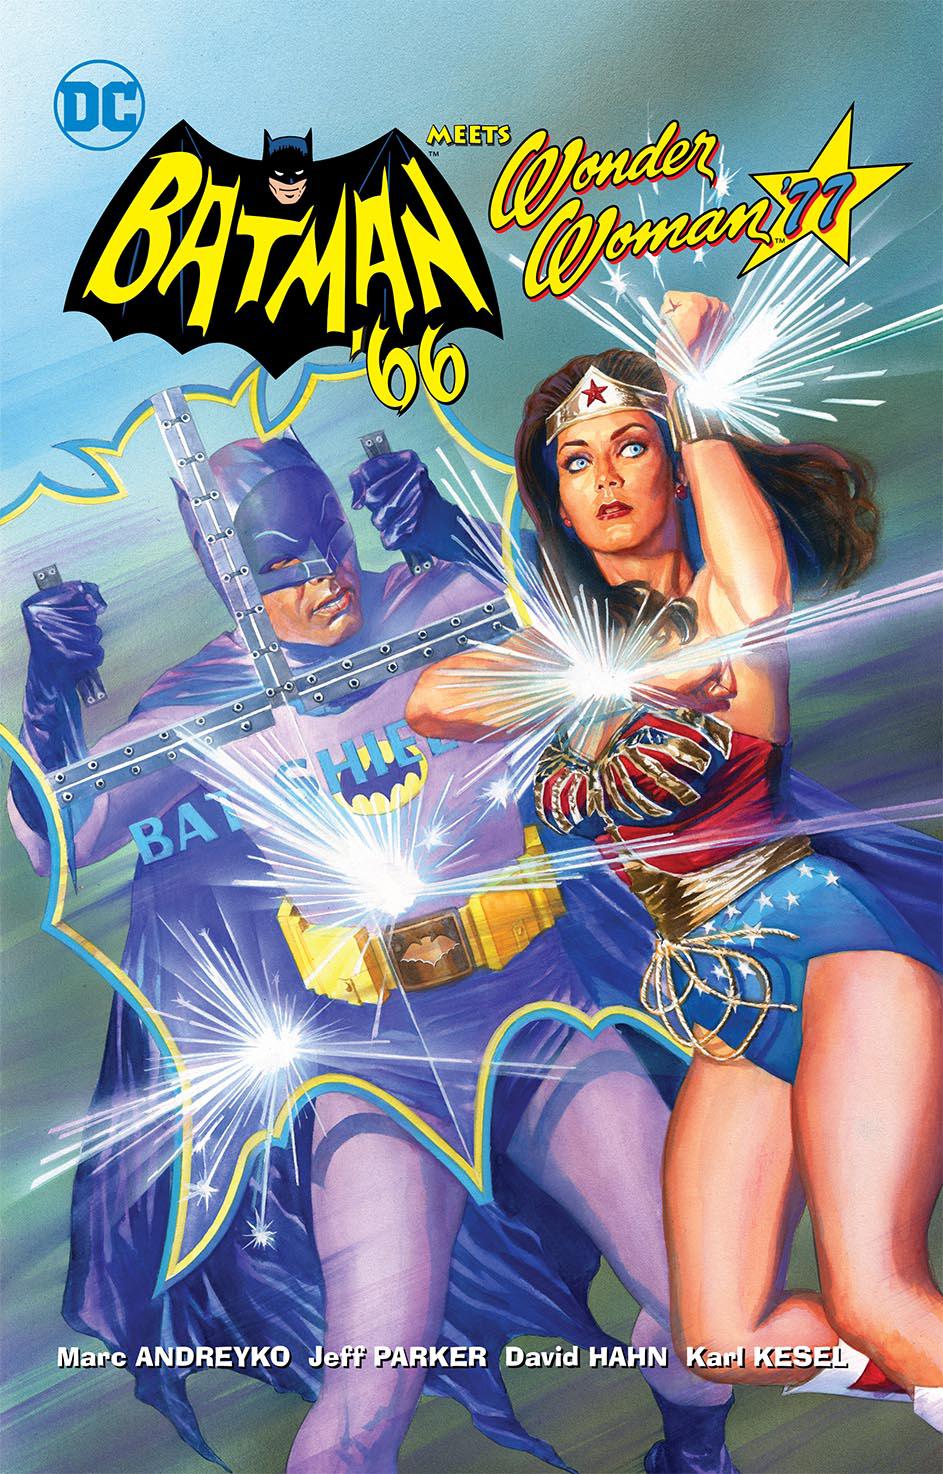 Batman '66 Meets Wonder Woman '77 - Graphic Novel Cover